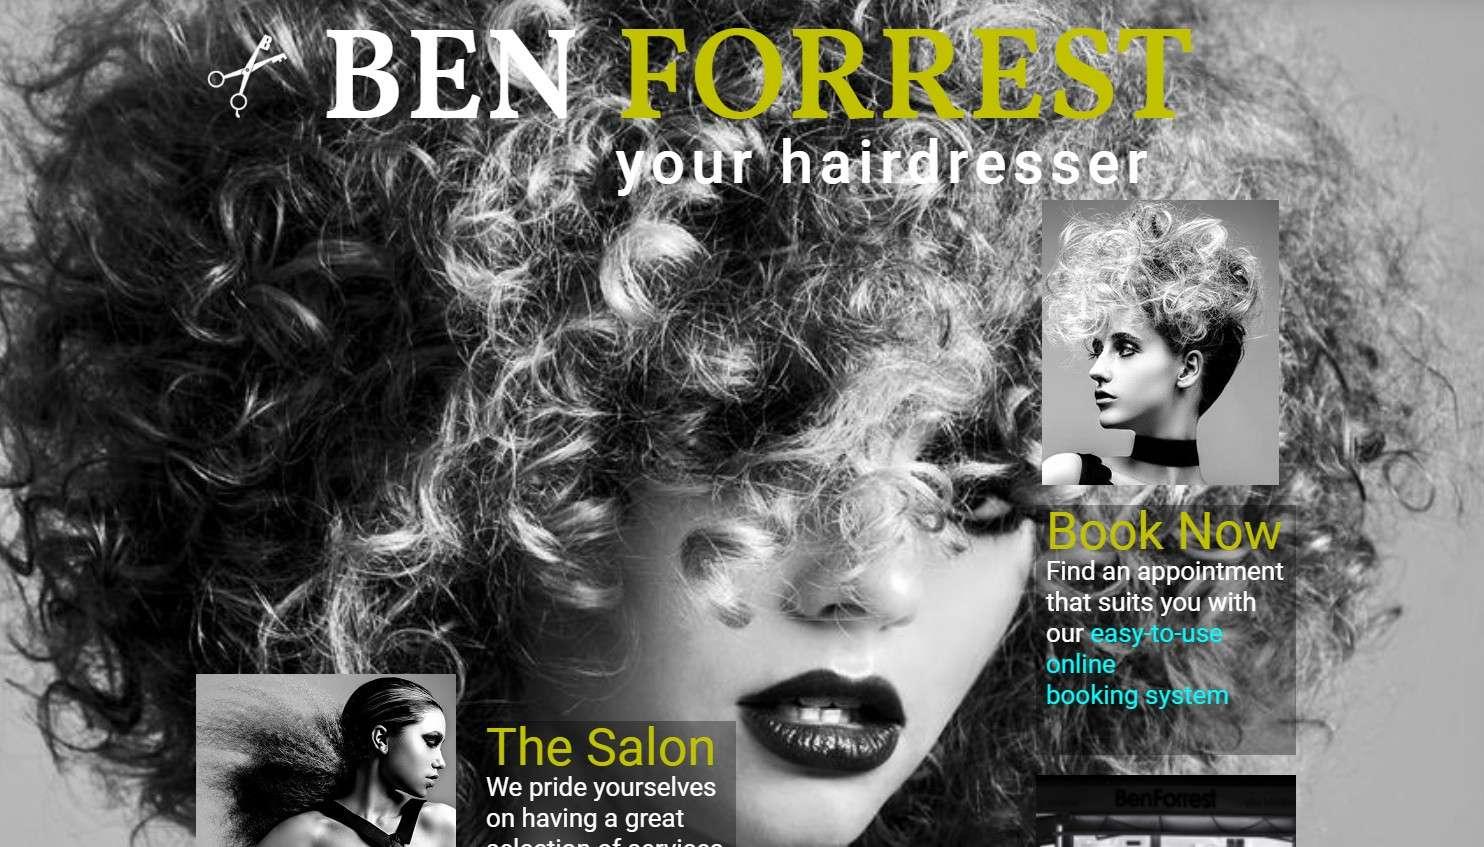 Ben Forrest Salons Website By T900 Website Design in Surrey